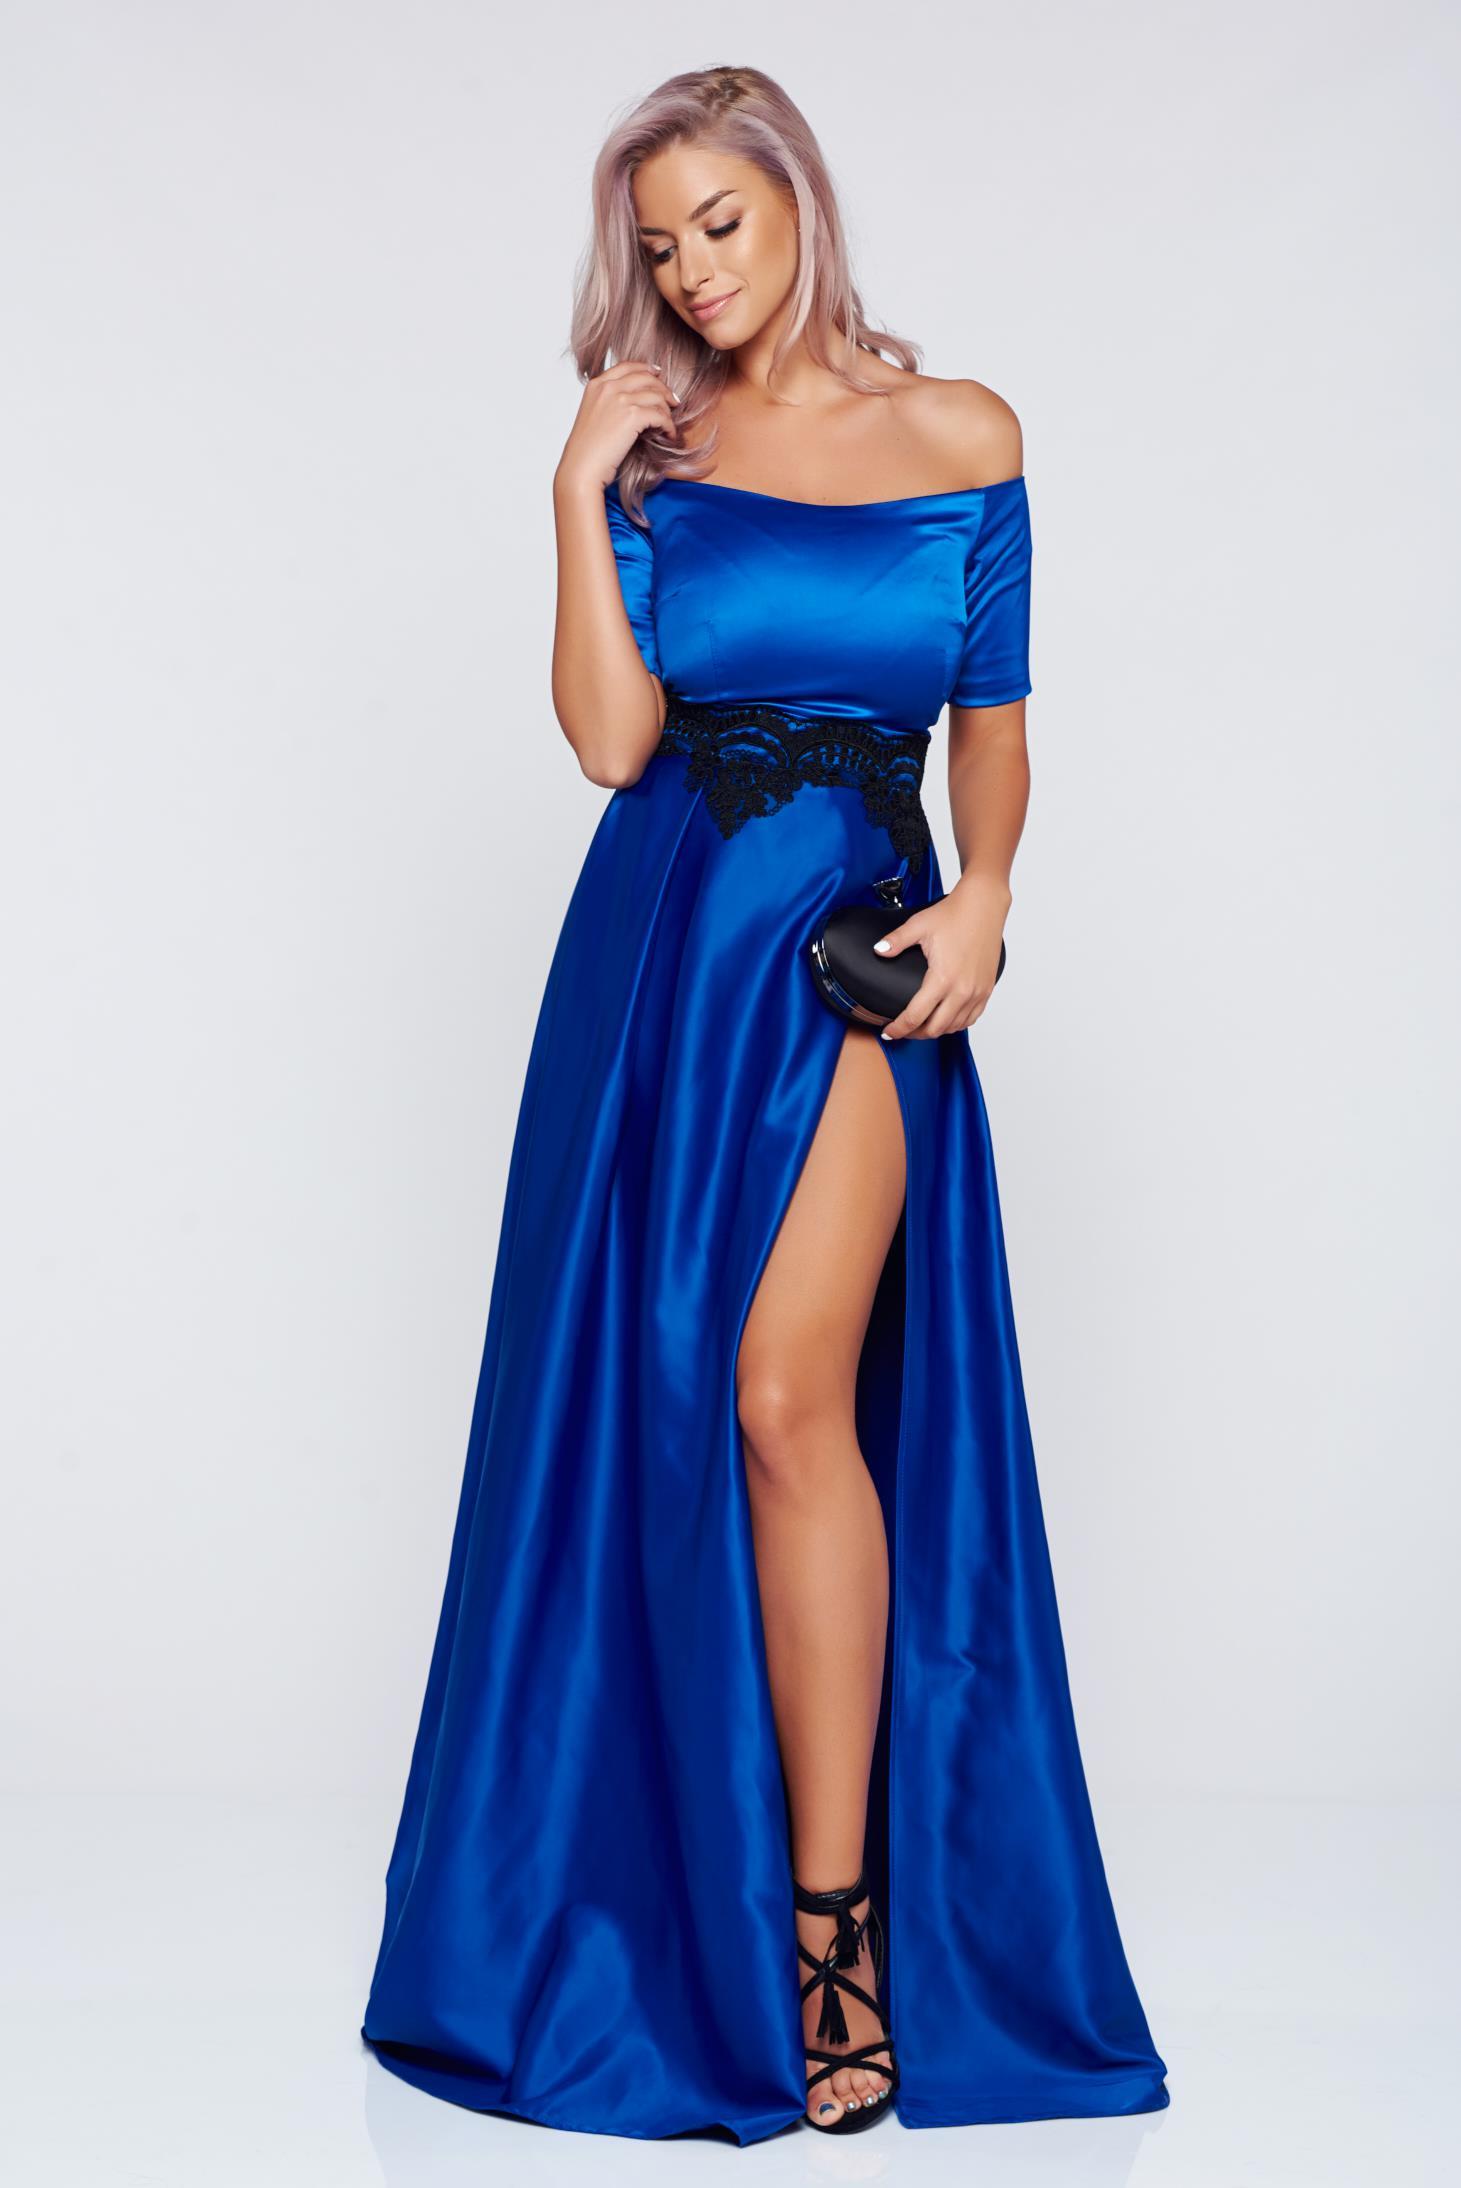 Rochie Artista albastra de ocazie din material satinat cu insertii de broderie